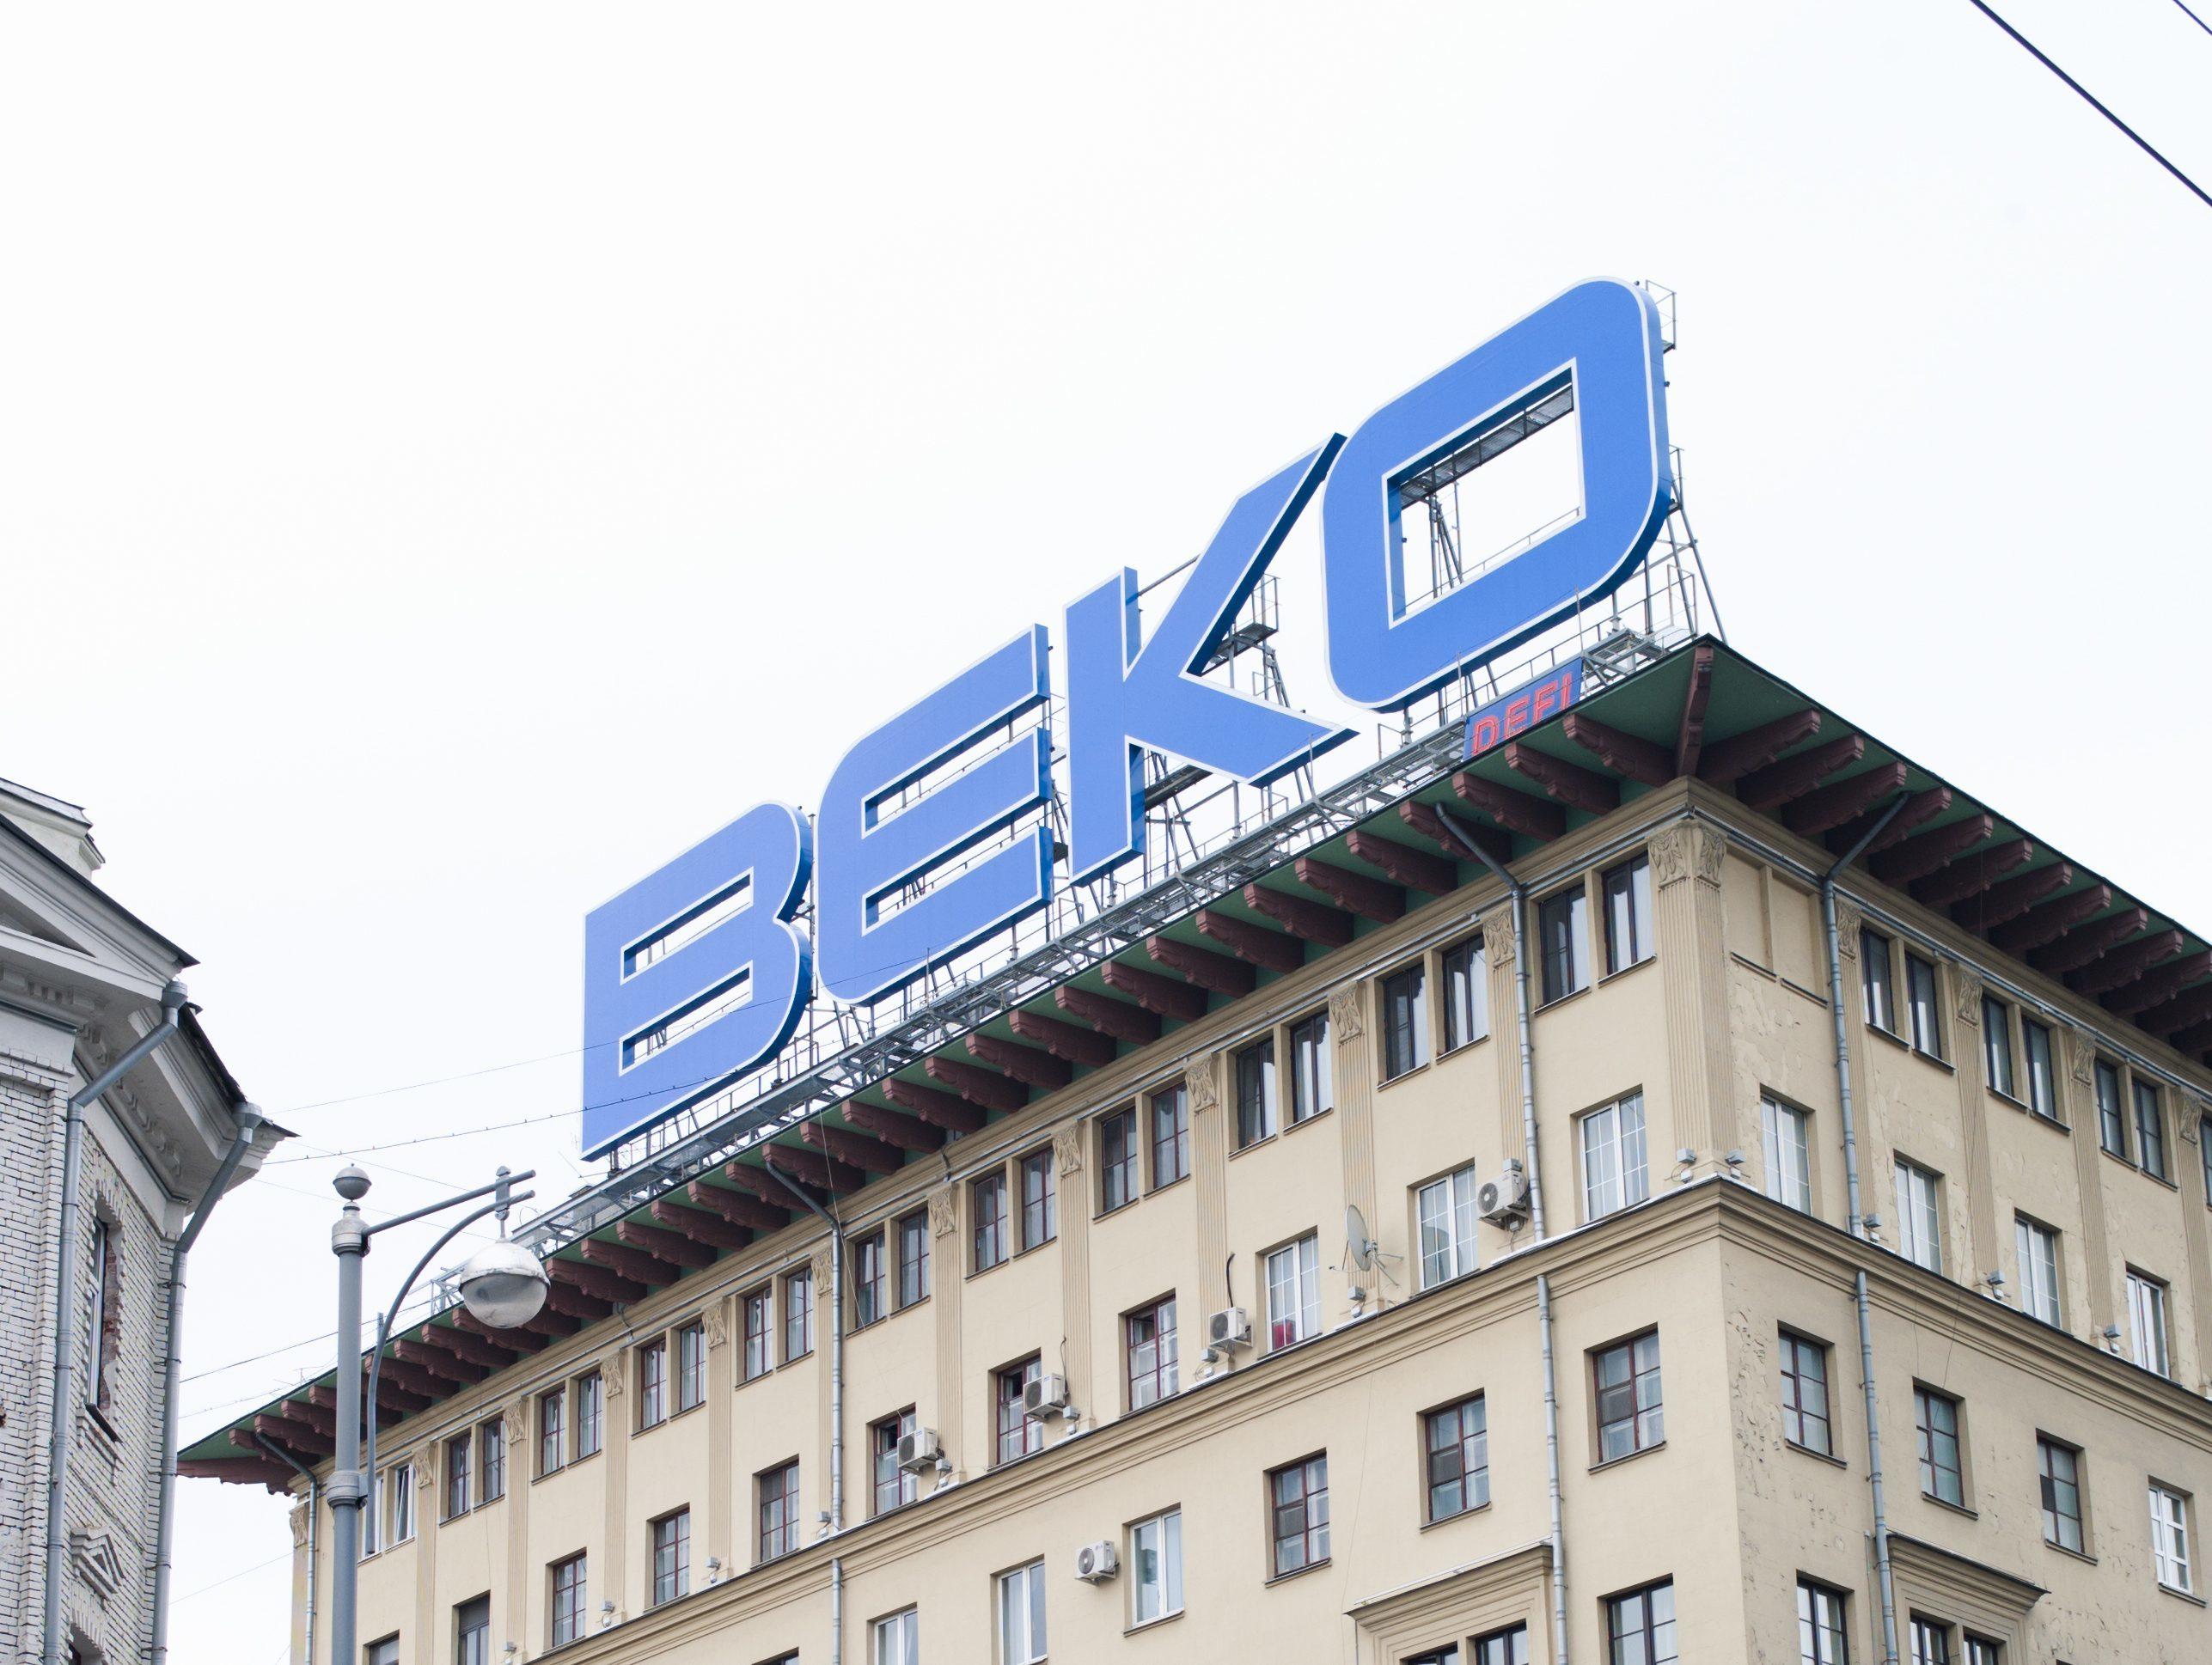 Beko (iStock)